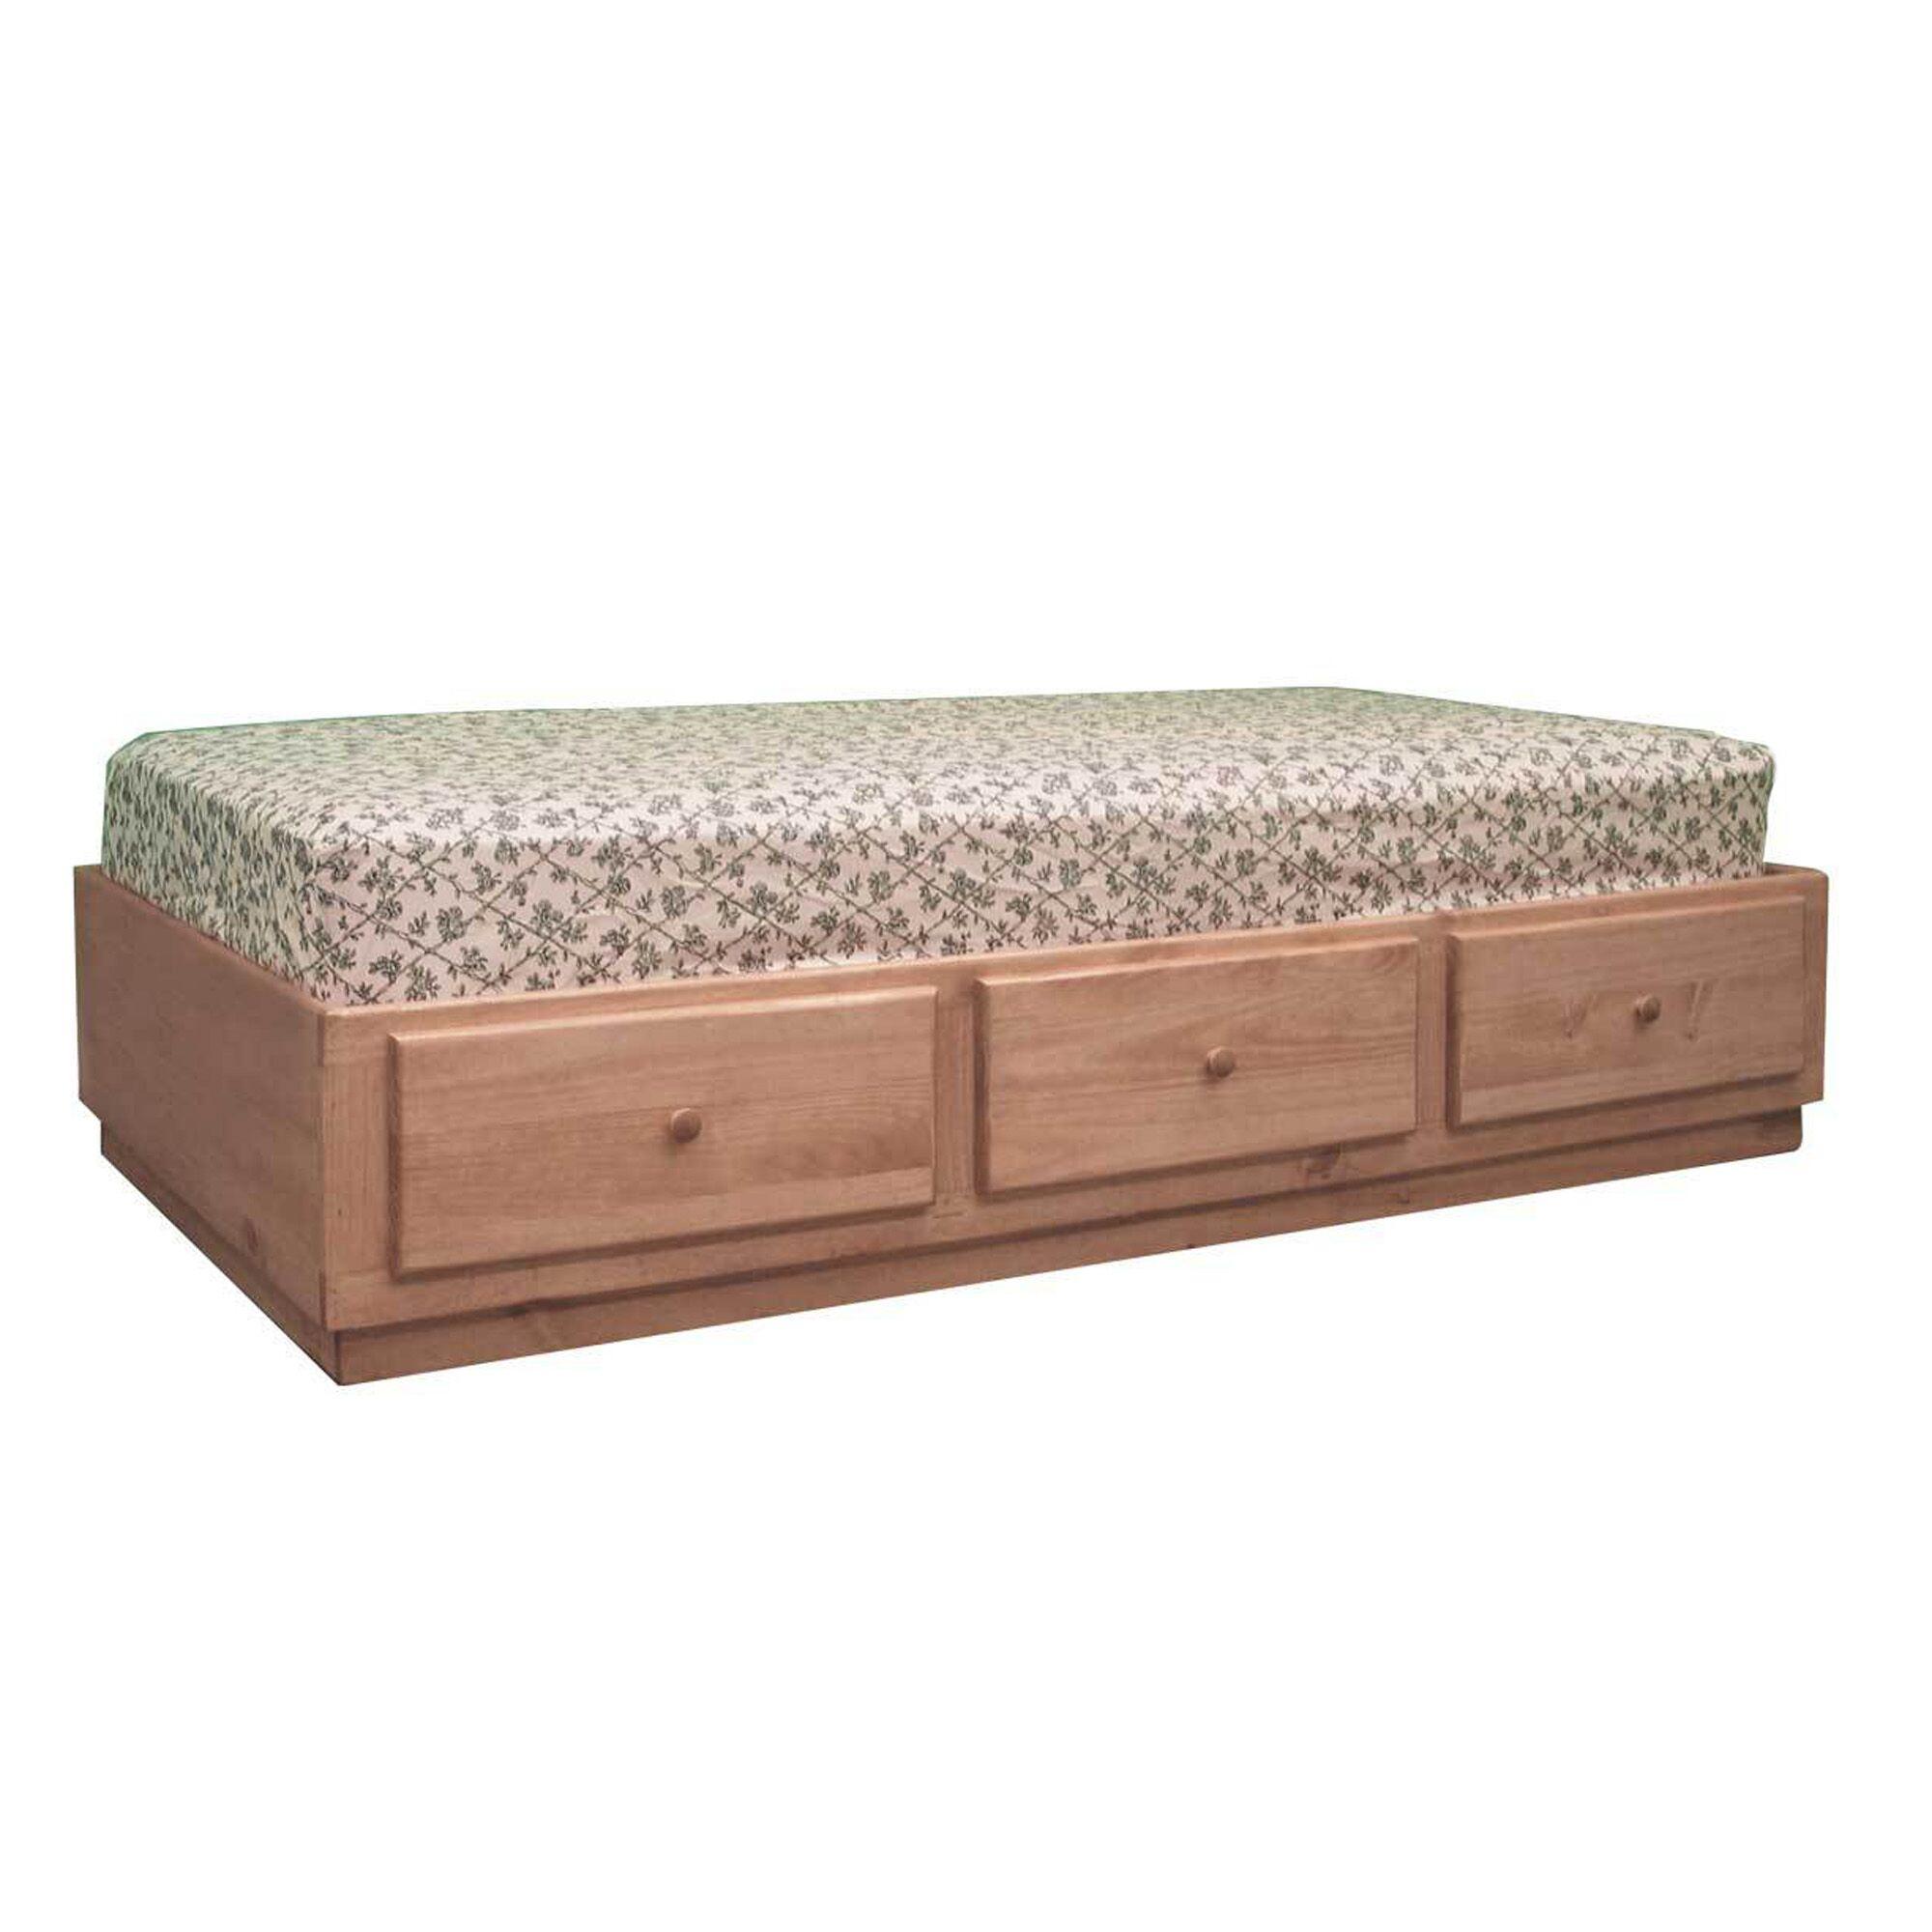 Captains Storage Platform Bed Color: Natural Teak, Size: Queen